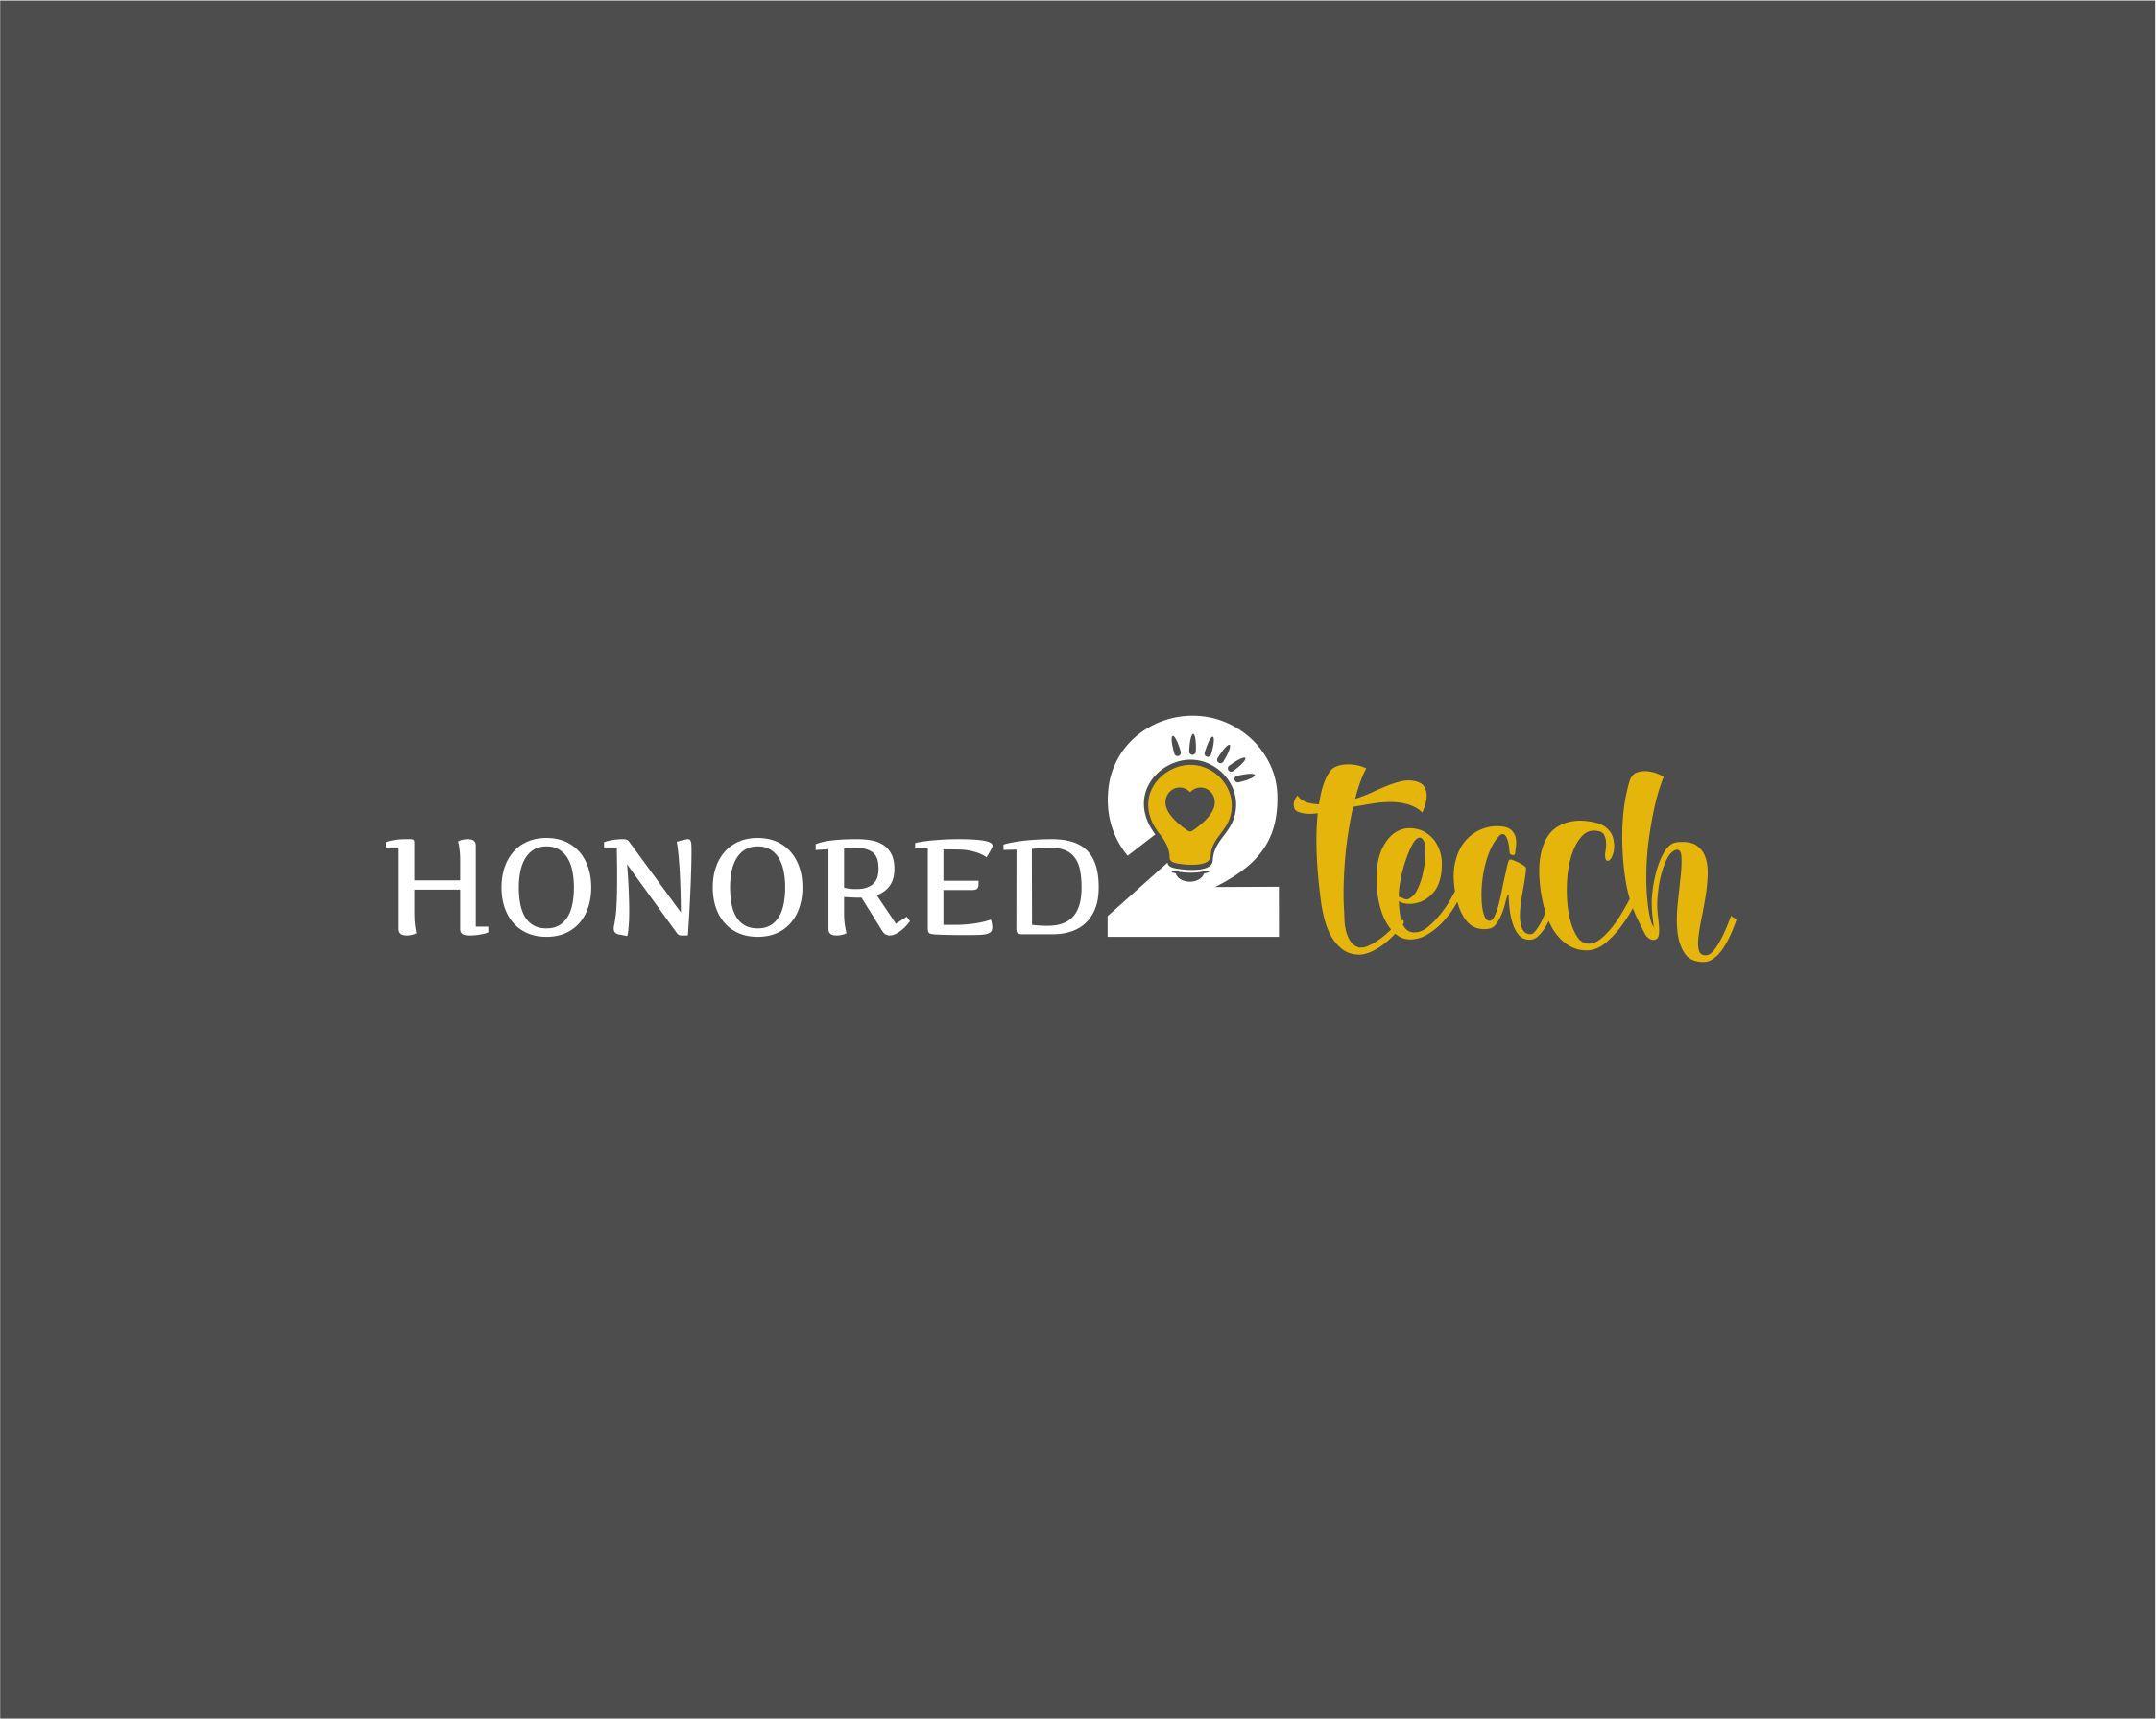 Create a design for an Educational Professional Development